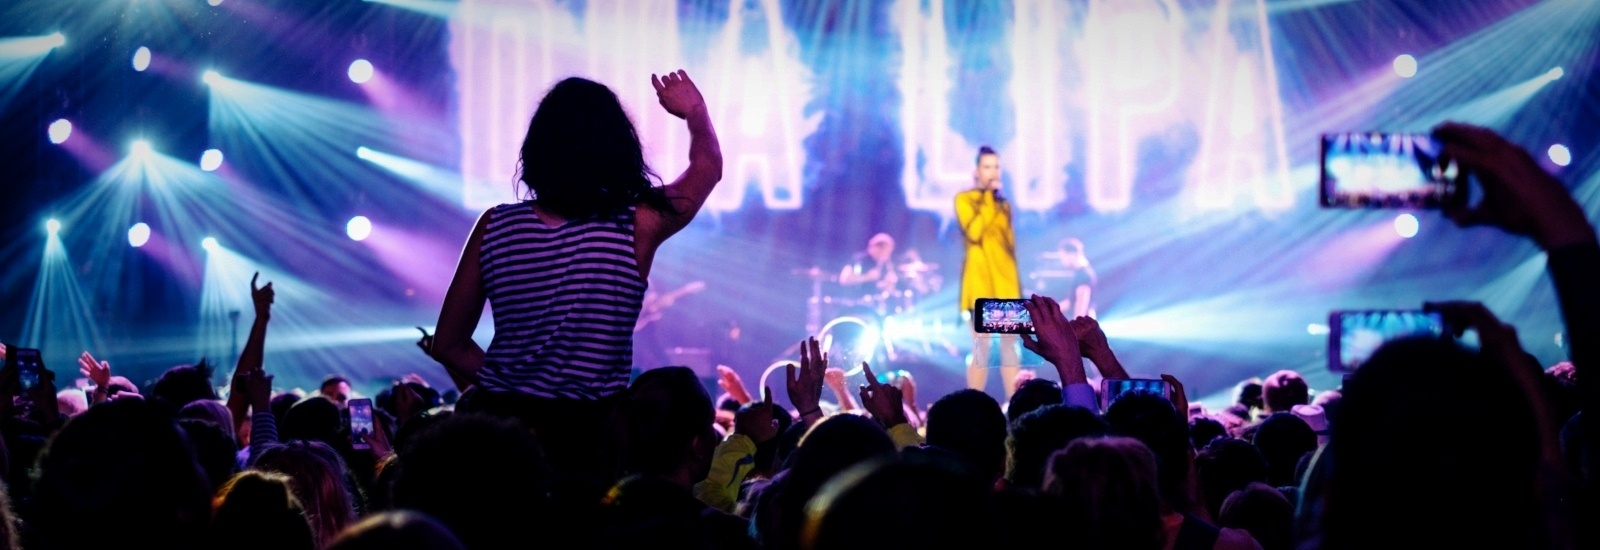 concert crowd-369670-edited-409739-edited.jpeg